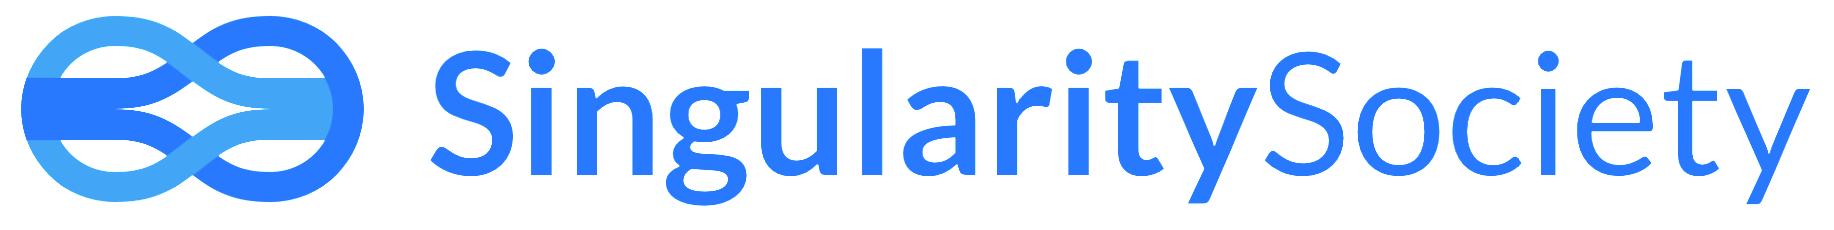 Singularity Societyのロゴ